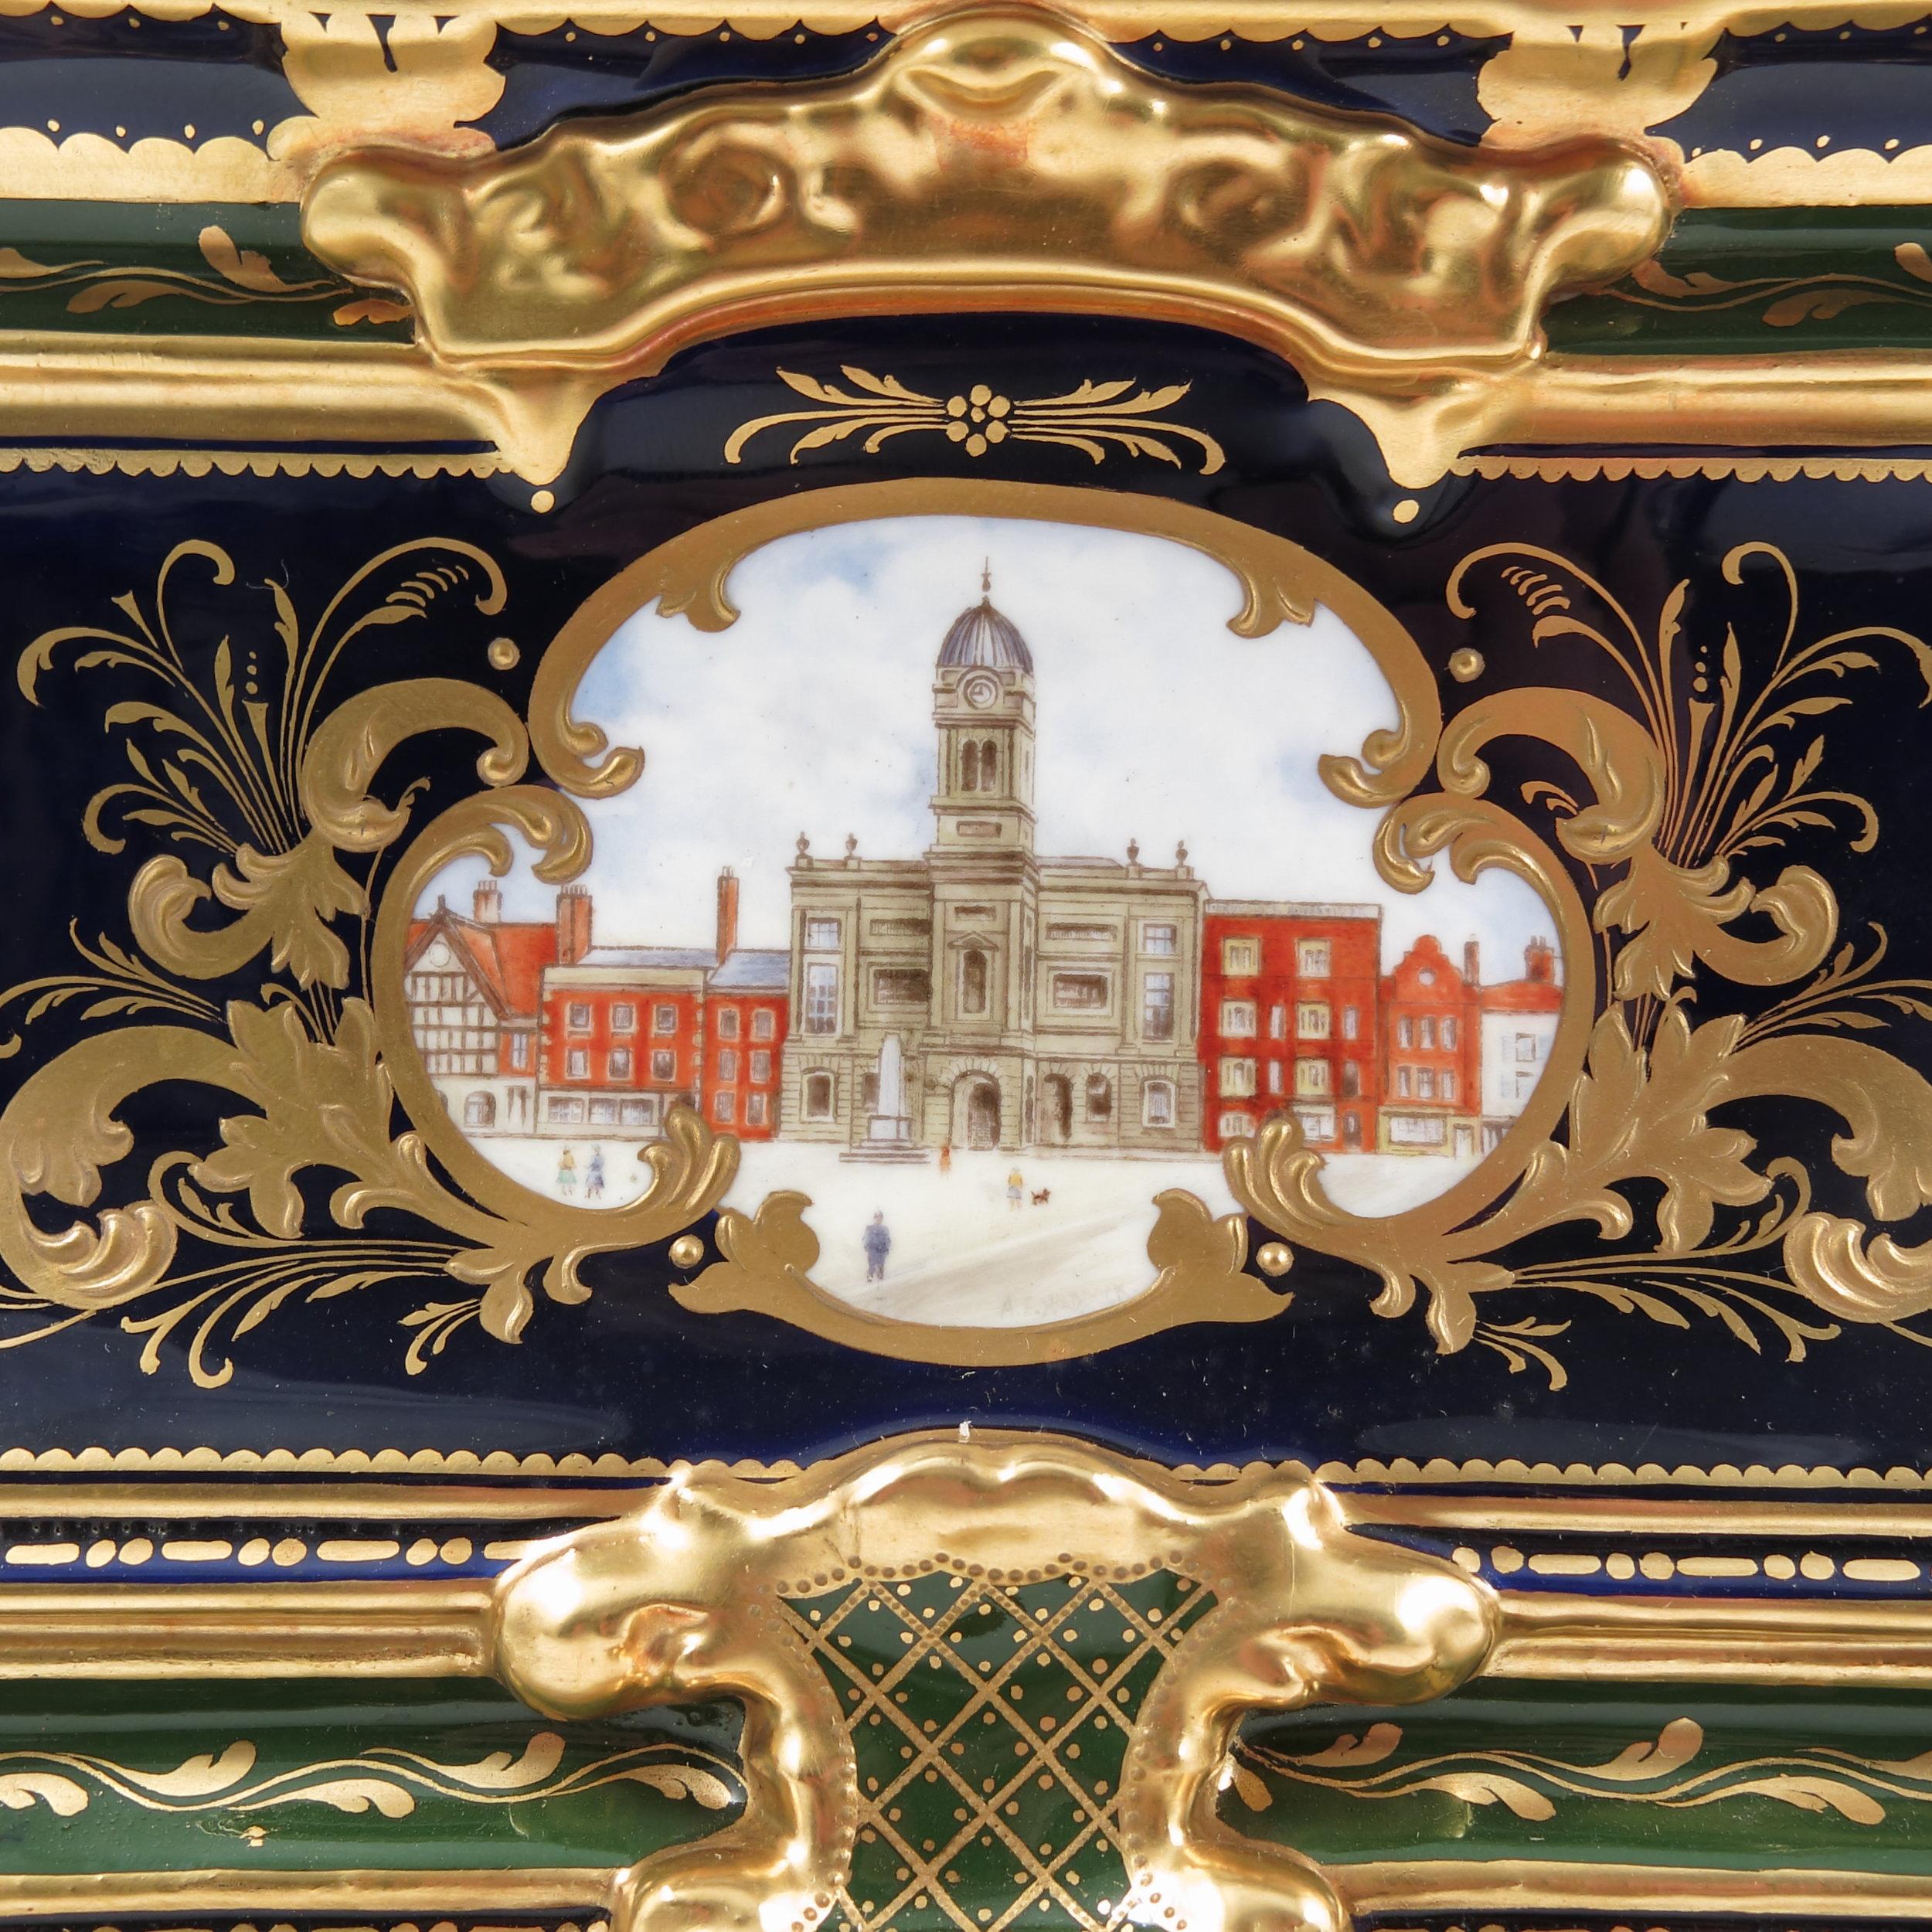 royal-crown-derby-freedom-casket-side-panel